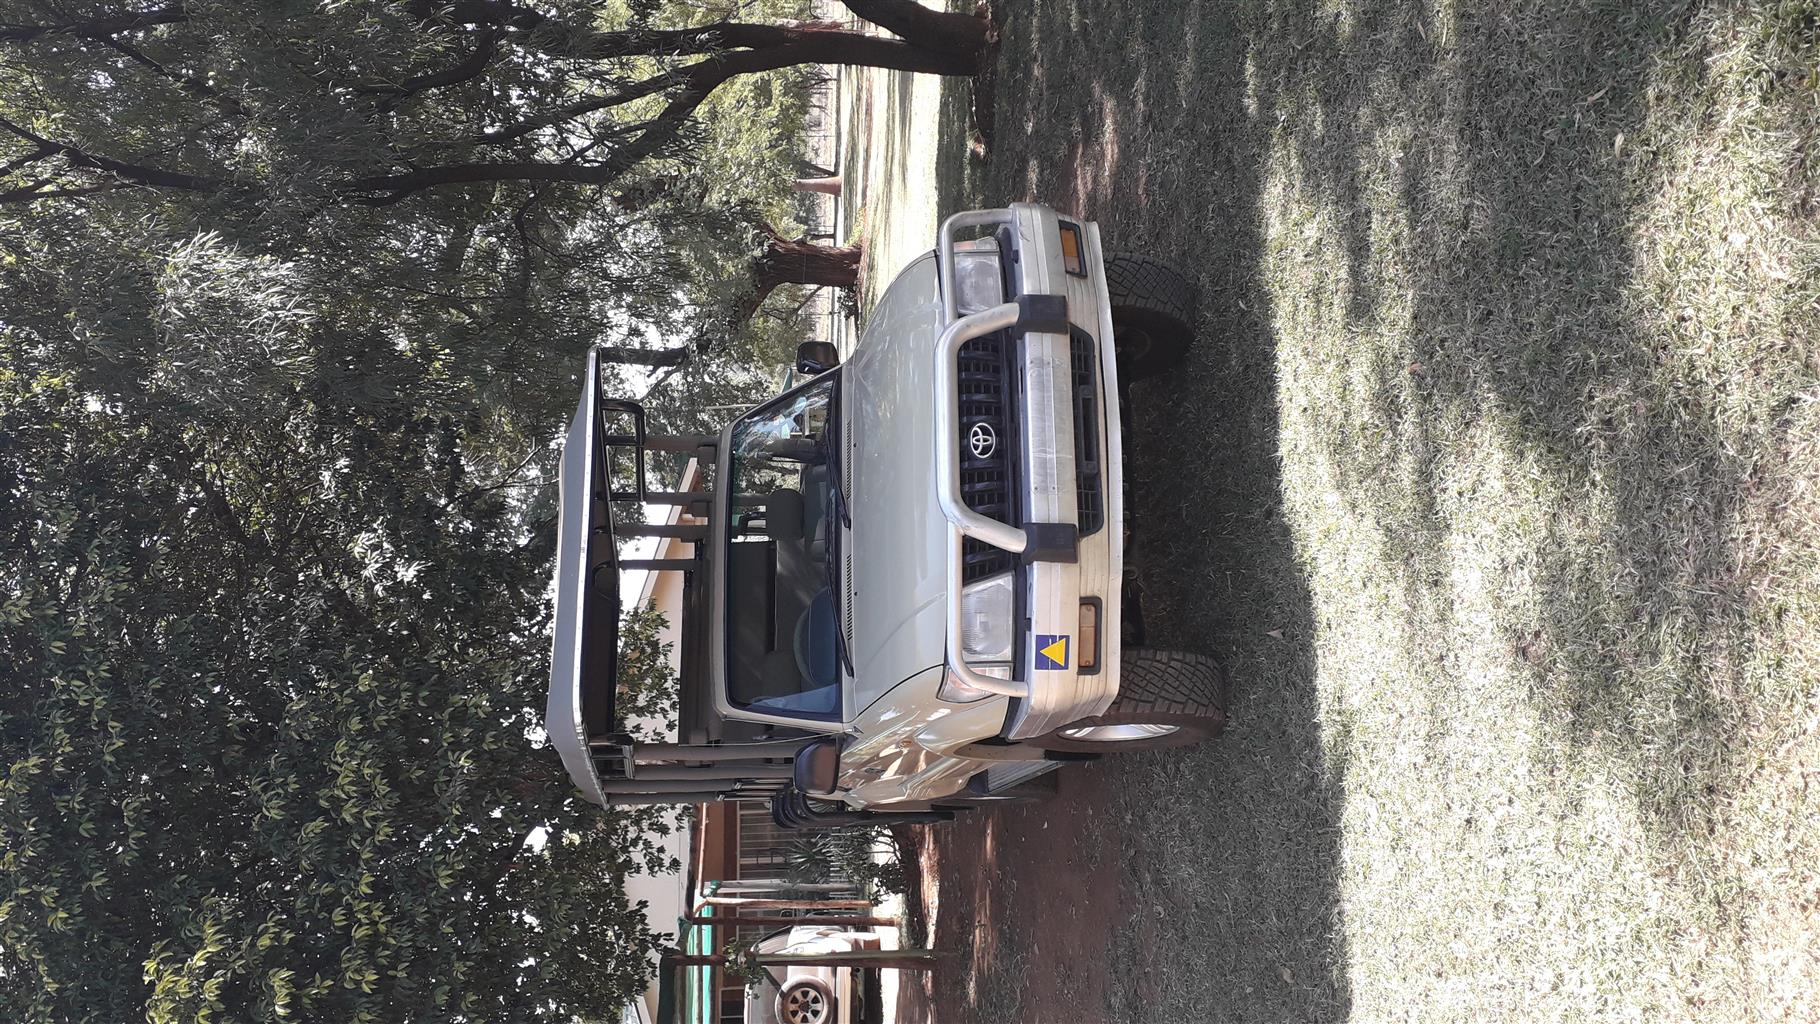 1998 Toyota Land Cruiser Prado 3.0DT VX